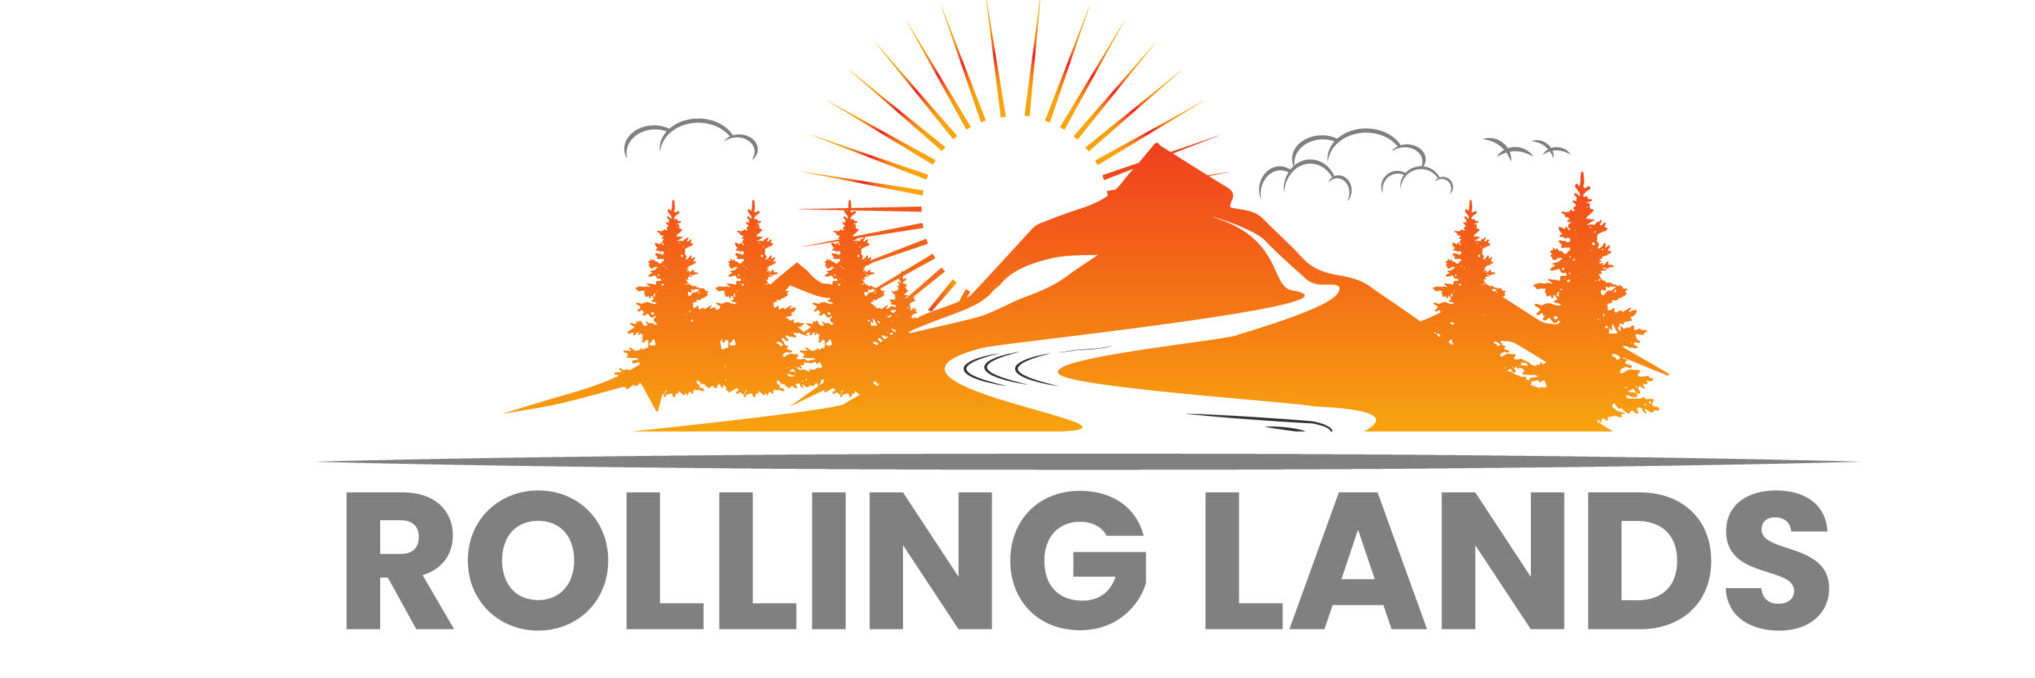 Rolling Lands